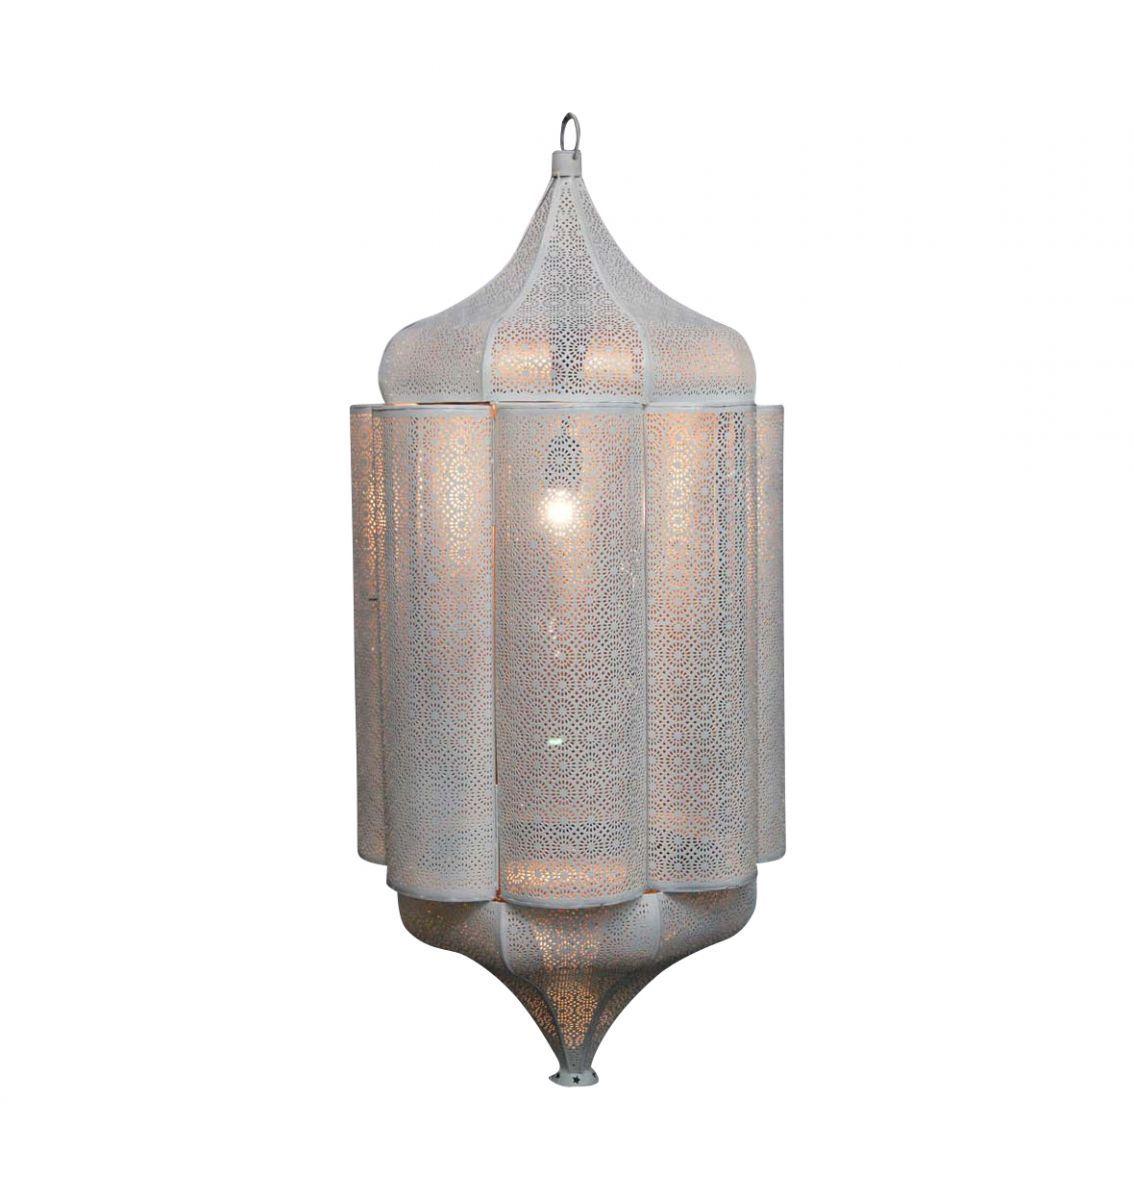 orintaalse filigrain hanglamp wit delhi hg99 42cm